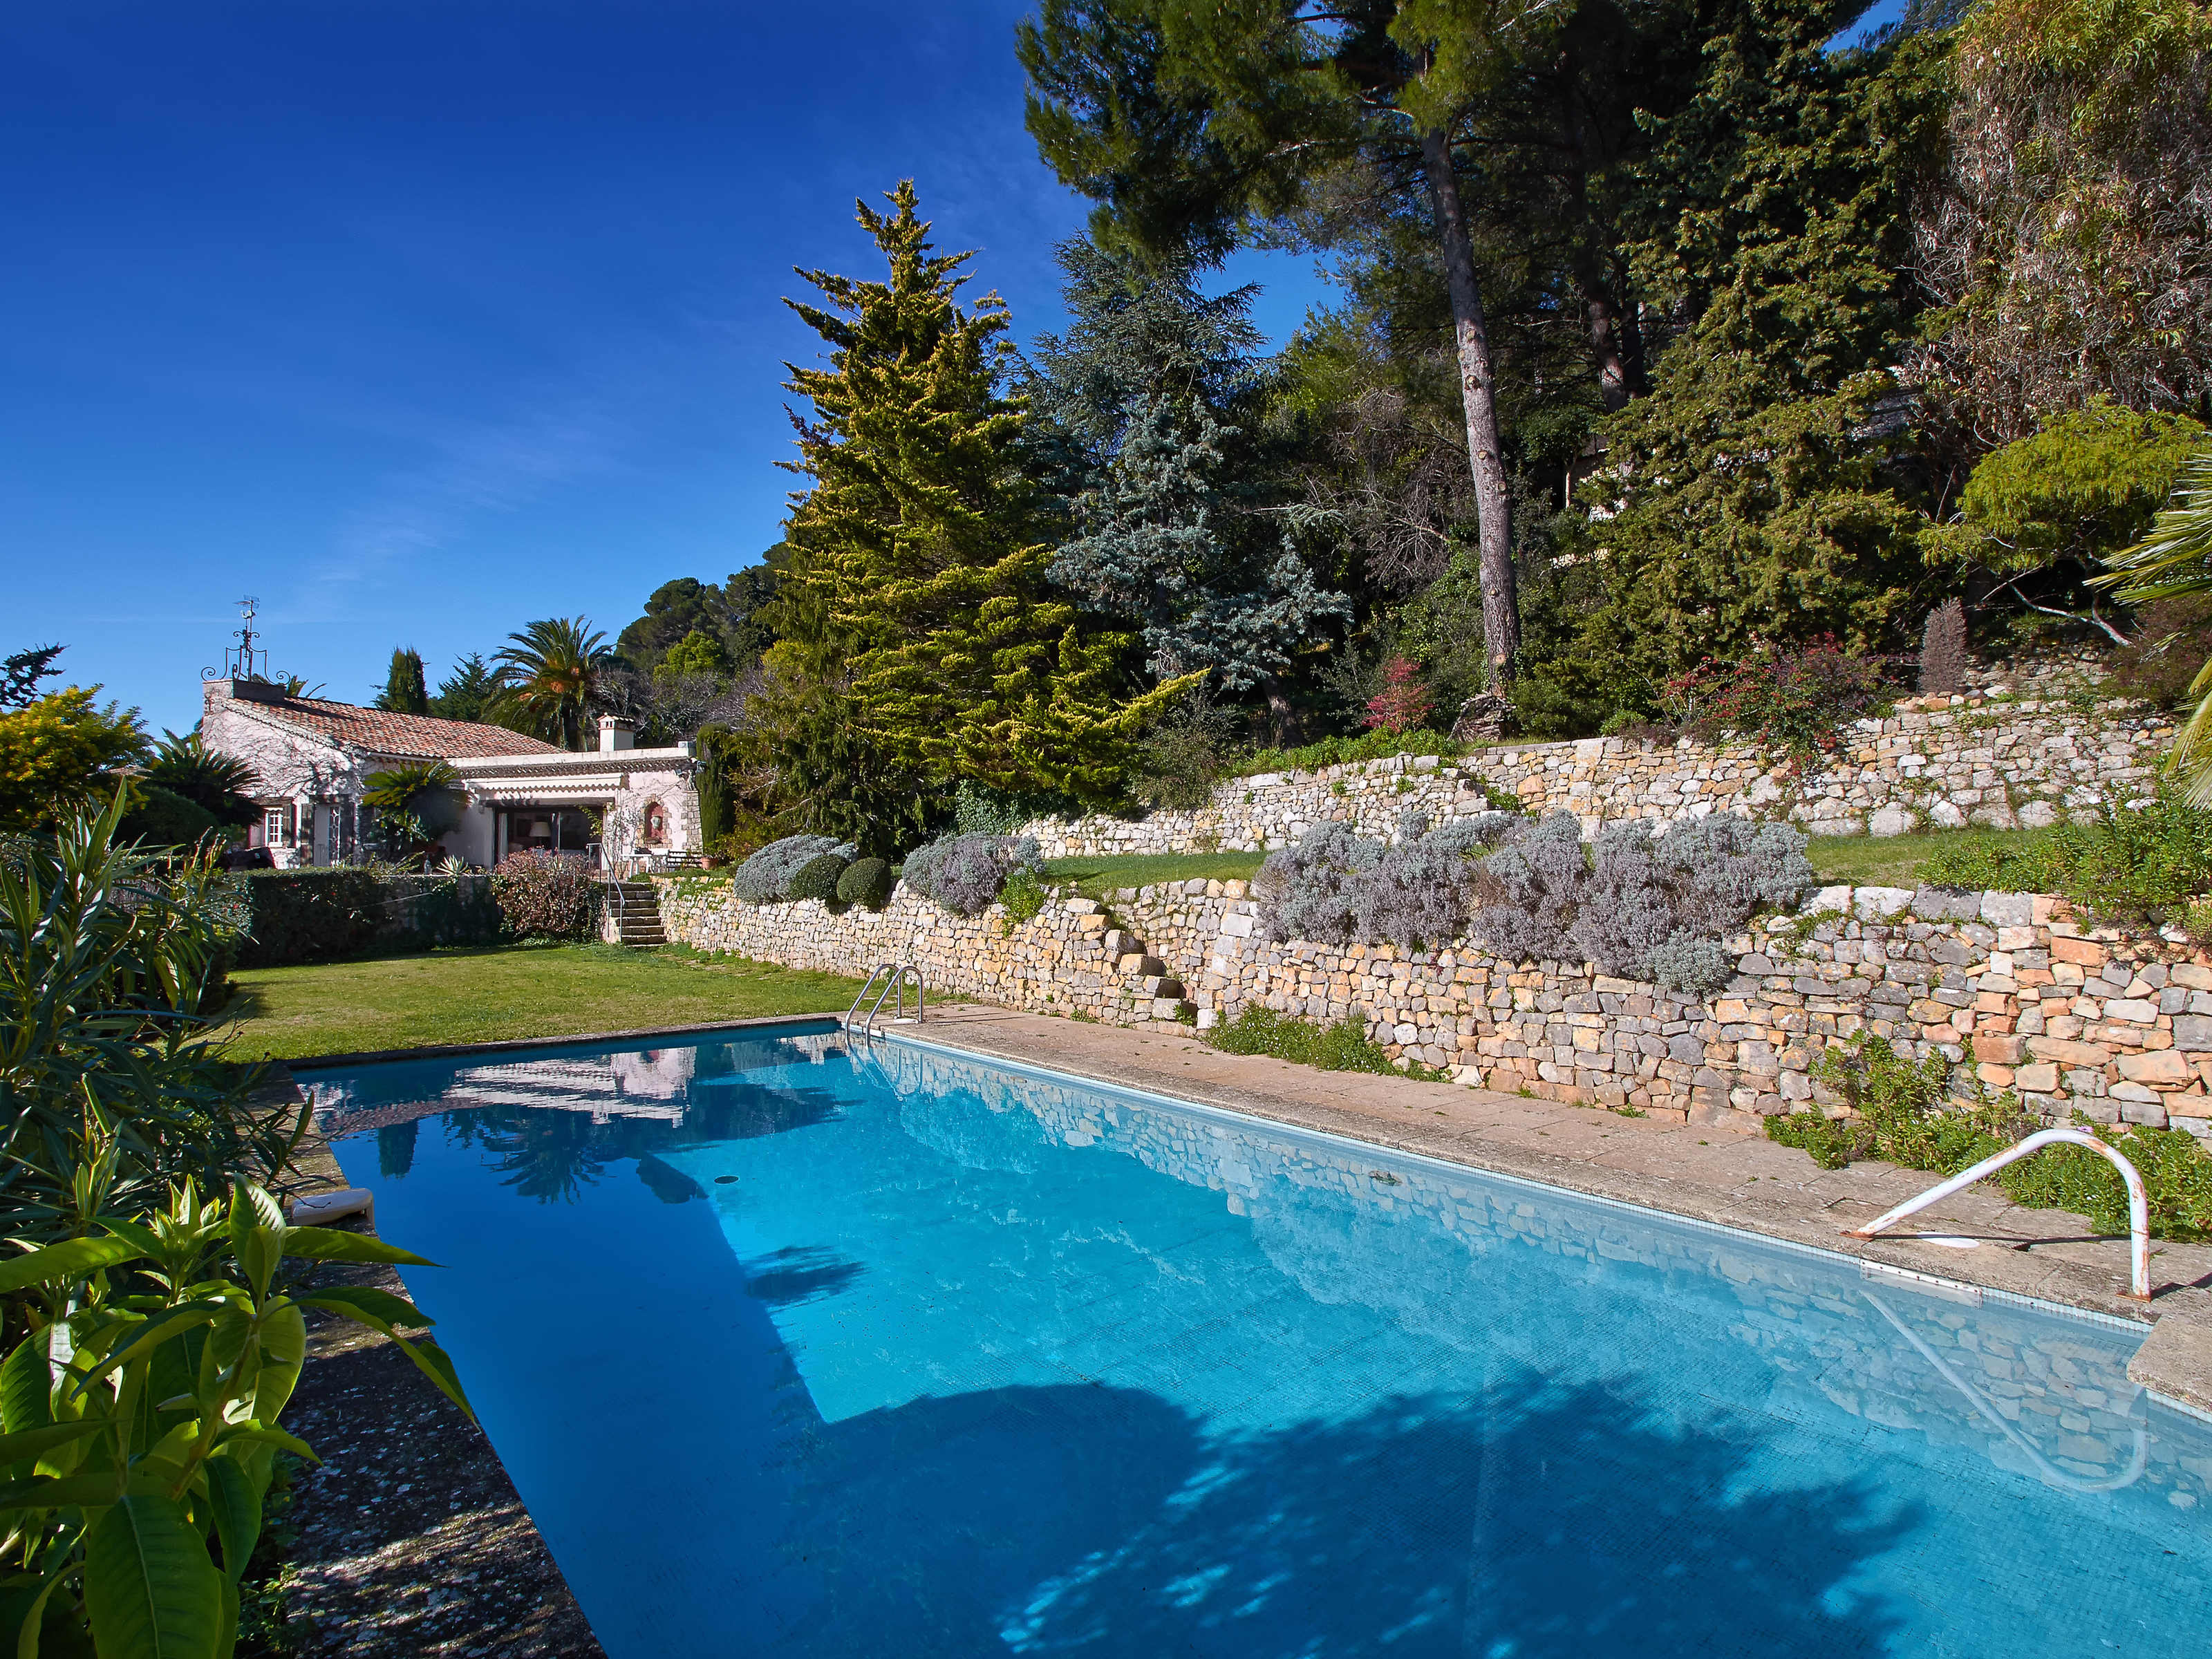 Casa Unifamiliar por un Venta en Provencal house with beautiful sea view Cannes, Provincia - Alpes - Costa Azul 06220 Francia